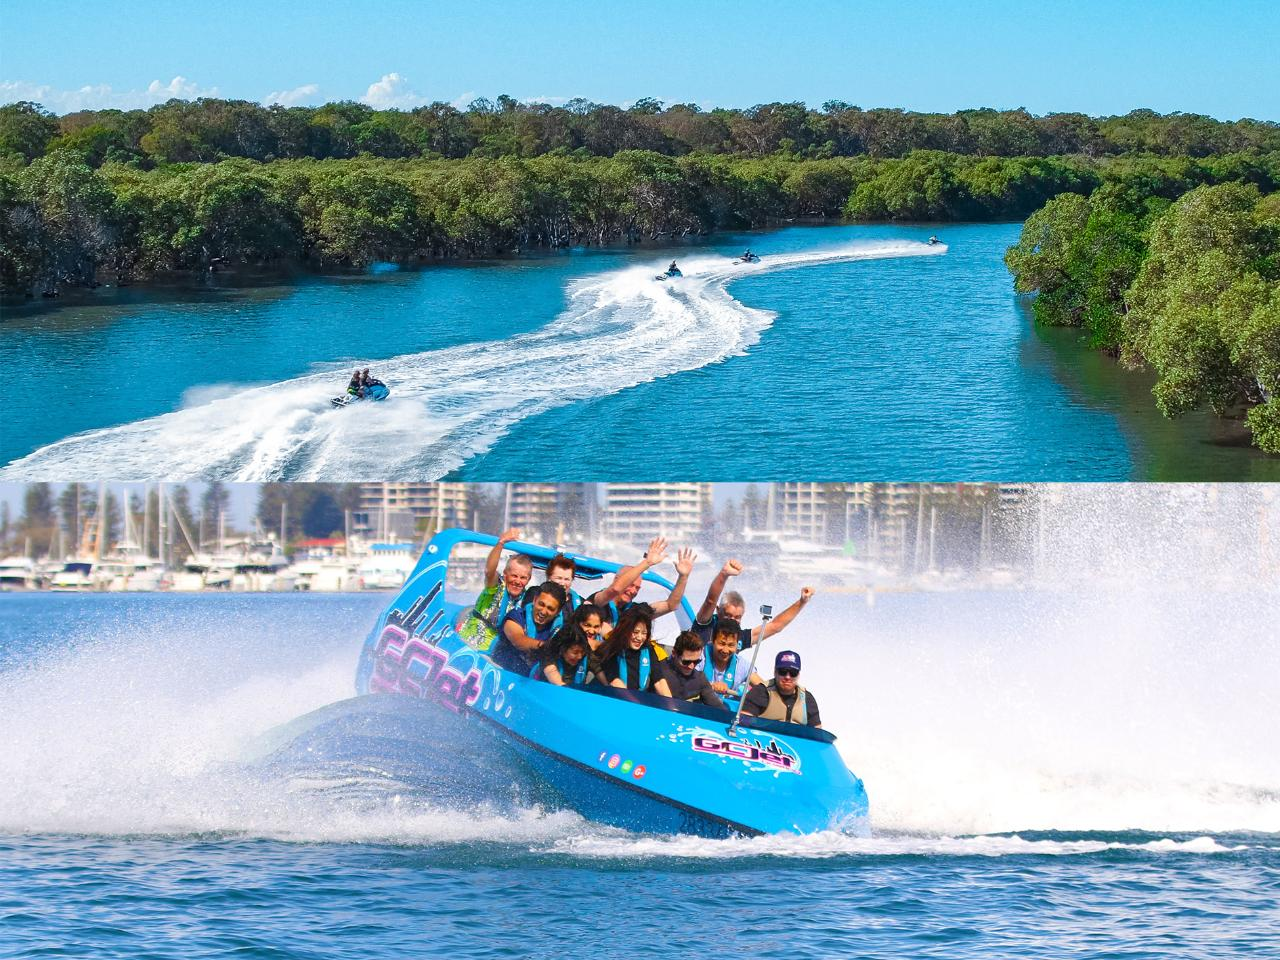 Jet boat & Jet Ski 2.5 hour - 2 Adults